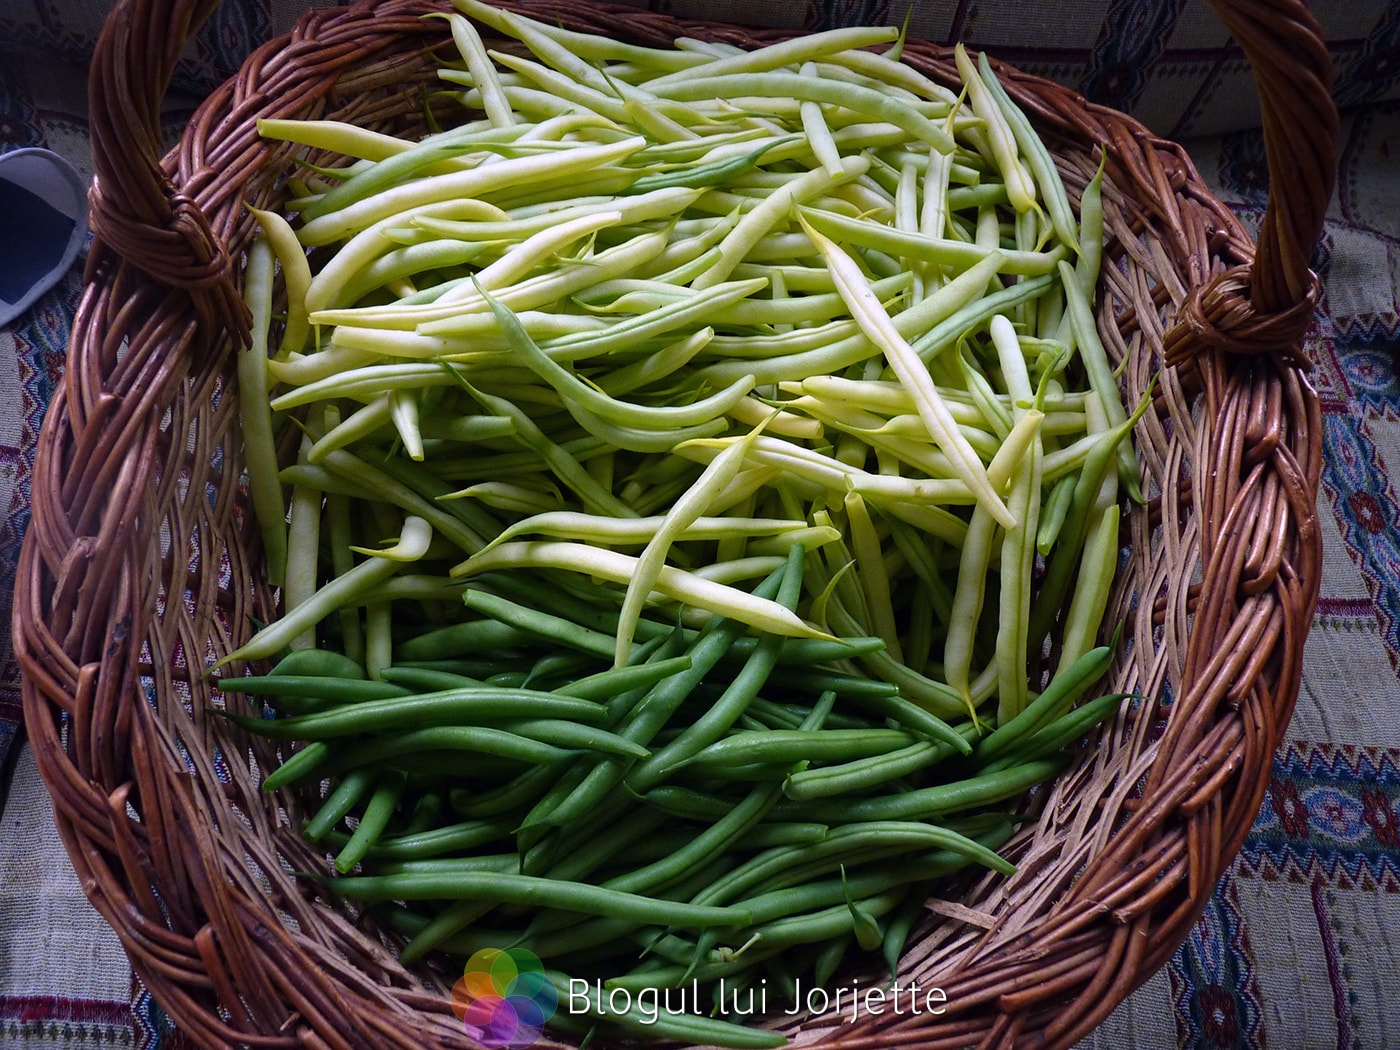 Imaginea thumbnail despre Fasolea uscata si fasolea verde – Beneficii, proprietati, remedii